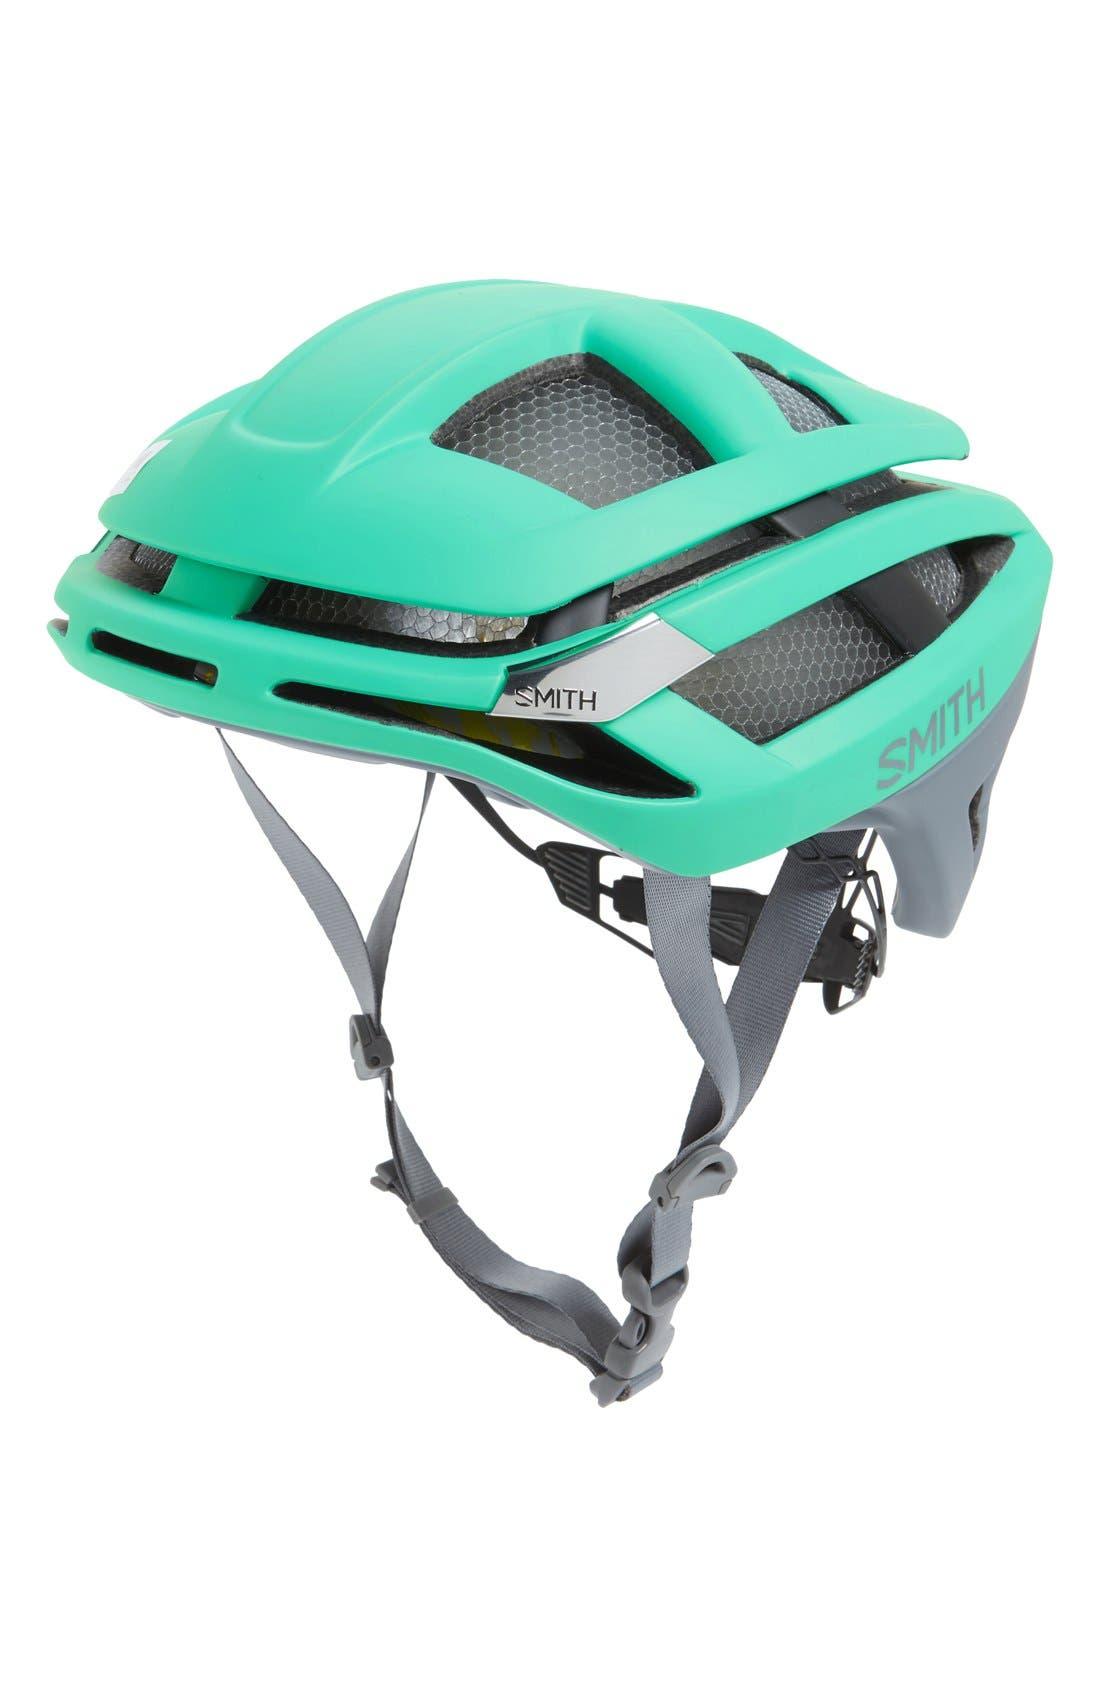 'Overtake With Mips' Biking Racer Helmet - Blue/Green, Matte Opal/ Charcoal